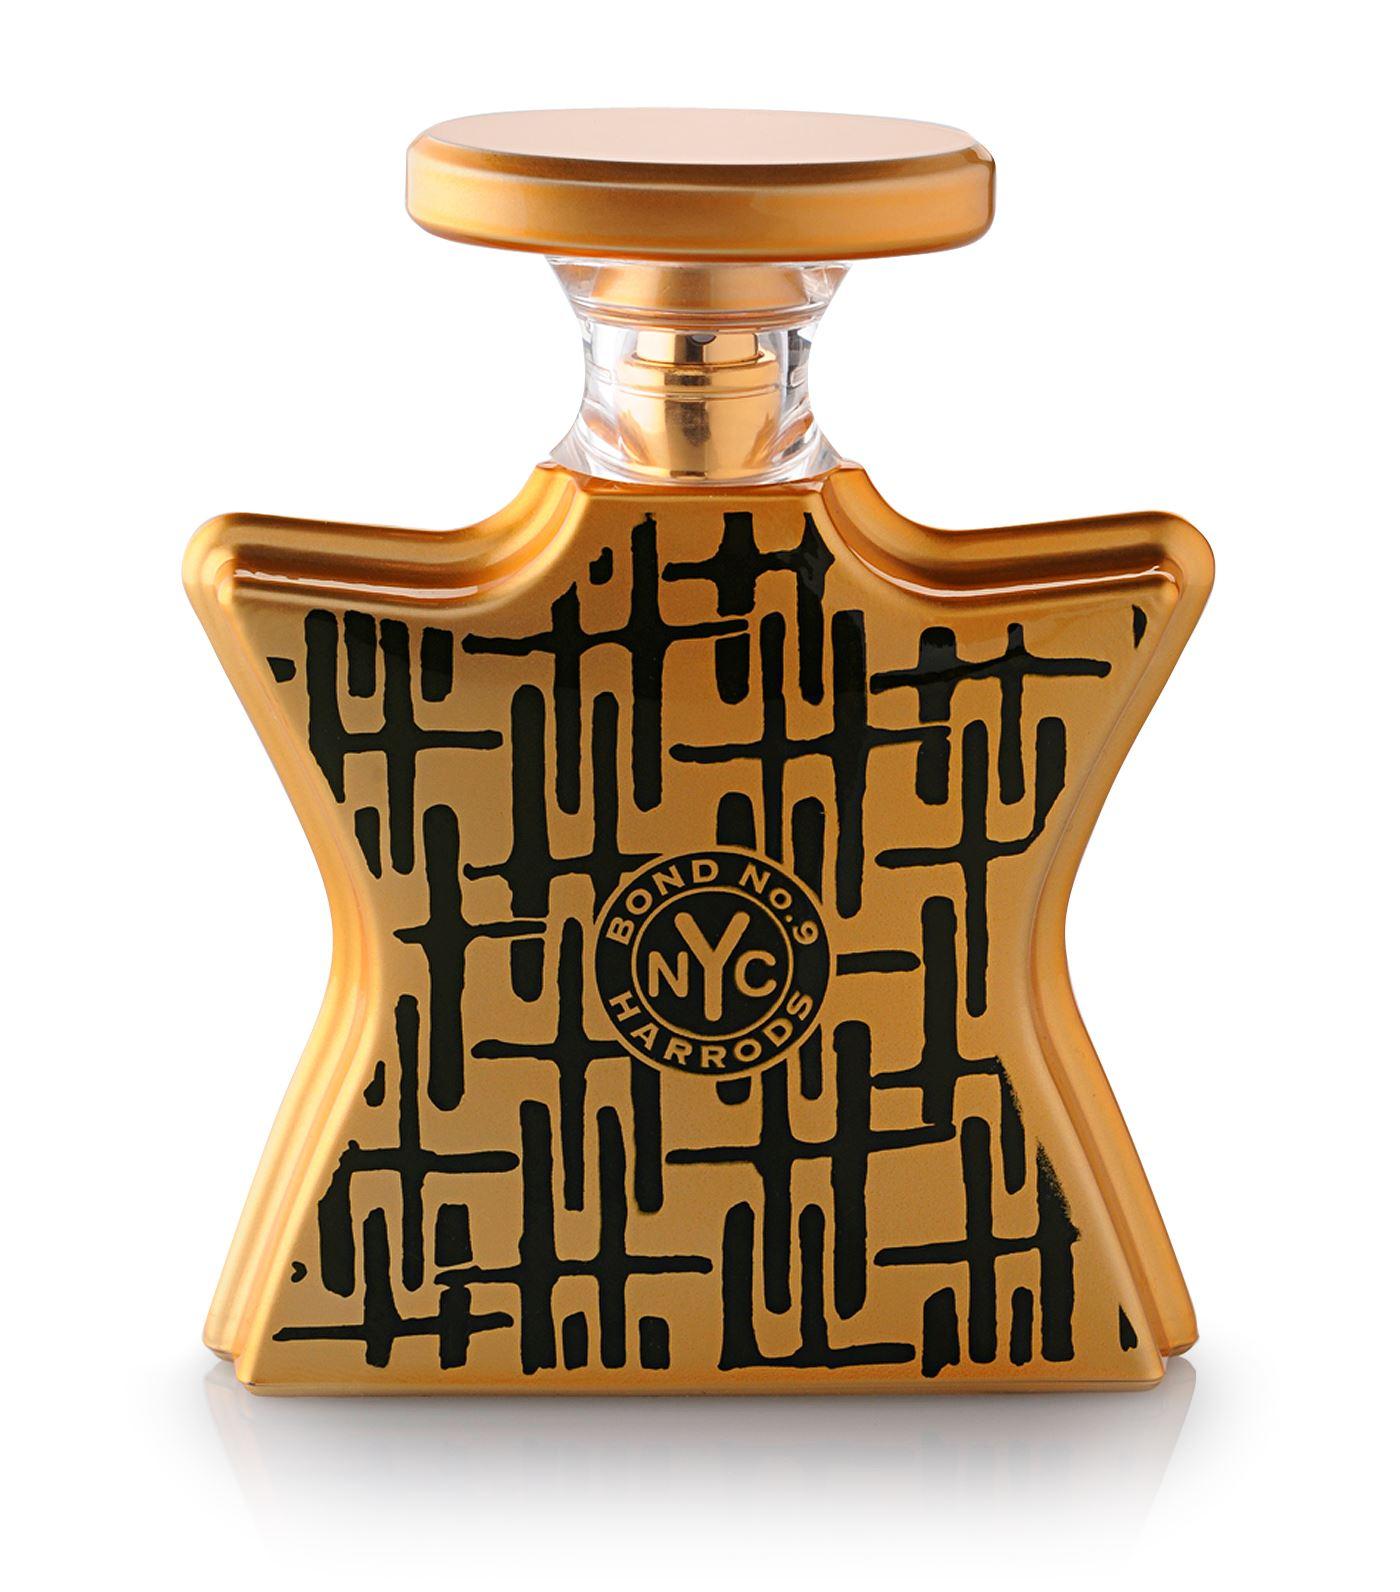 Bond No. 9 - New York perfume house Bond No. 9 has enjoyed a special relationship with Harrods for m